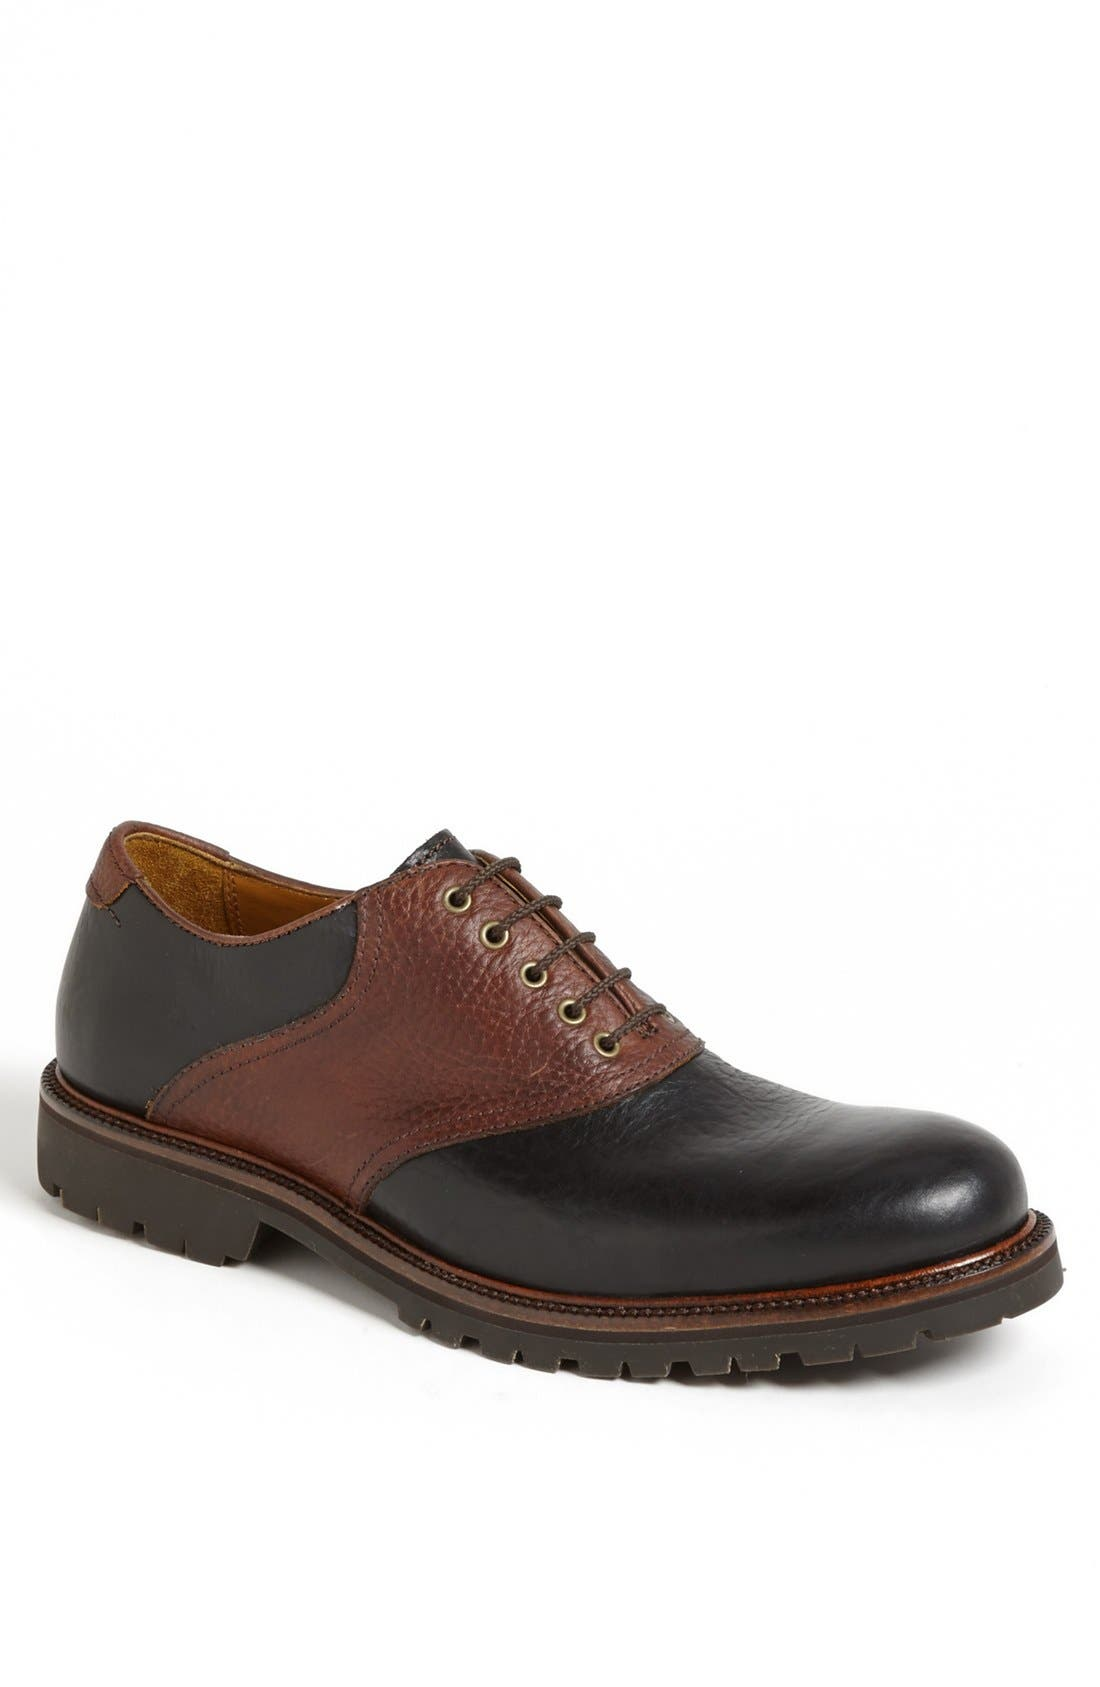 Alternate Image 1 Selected - Trask 'Garland' Saddle Shoe (Men)